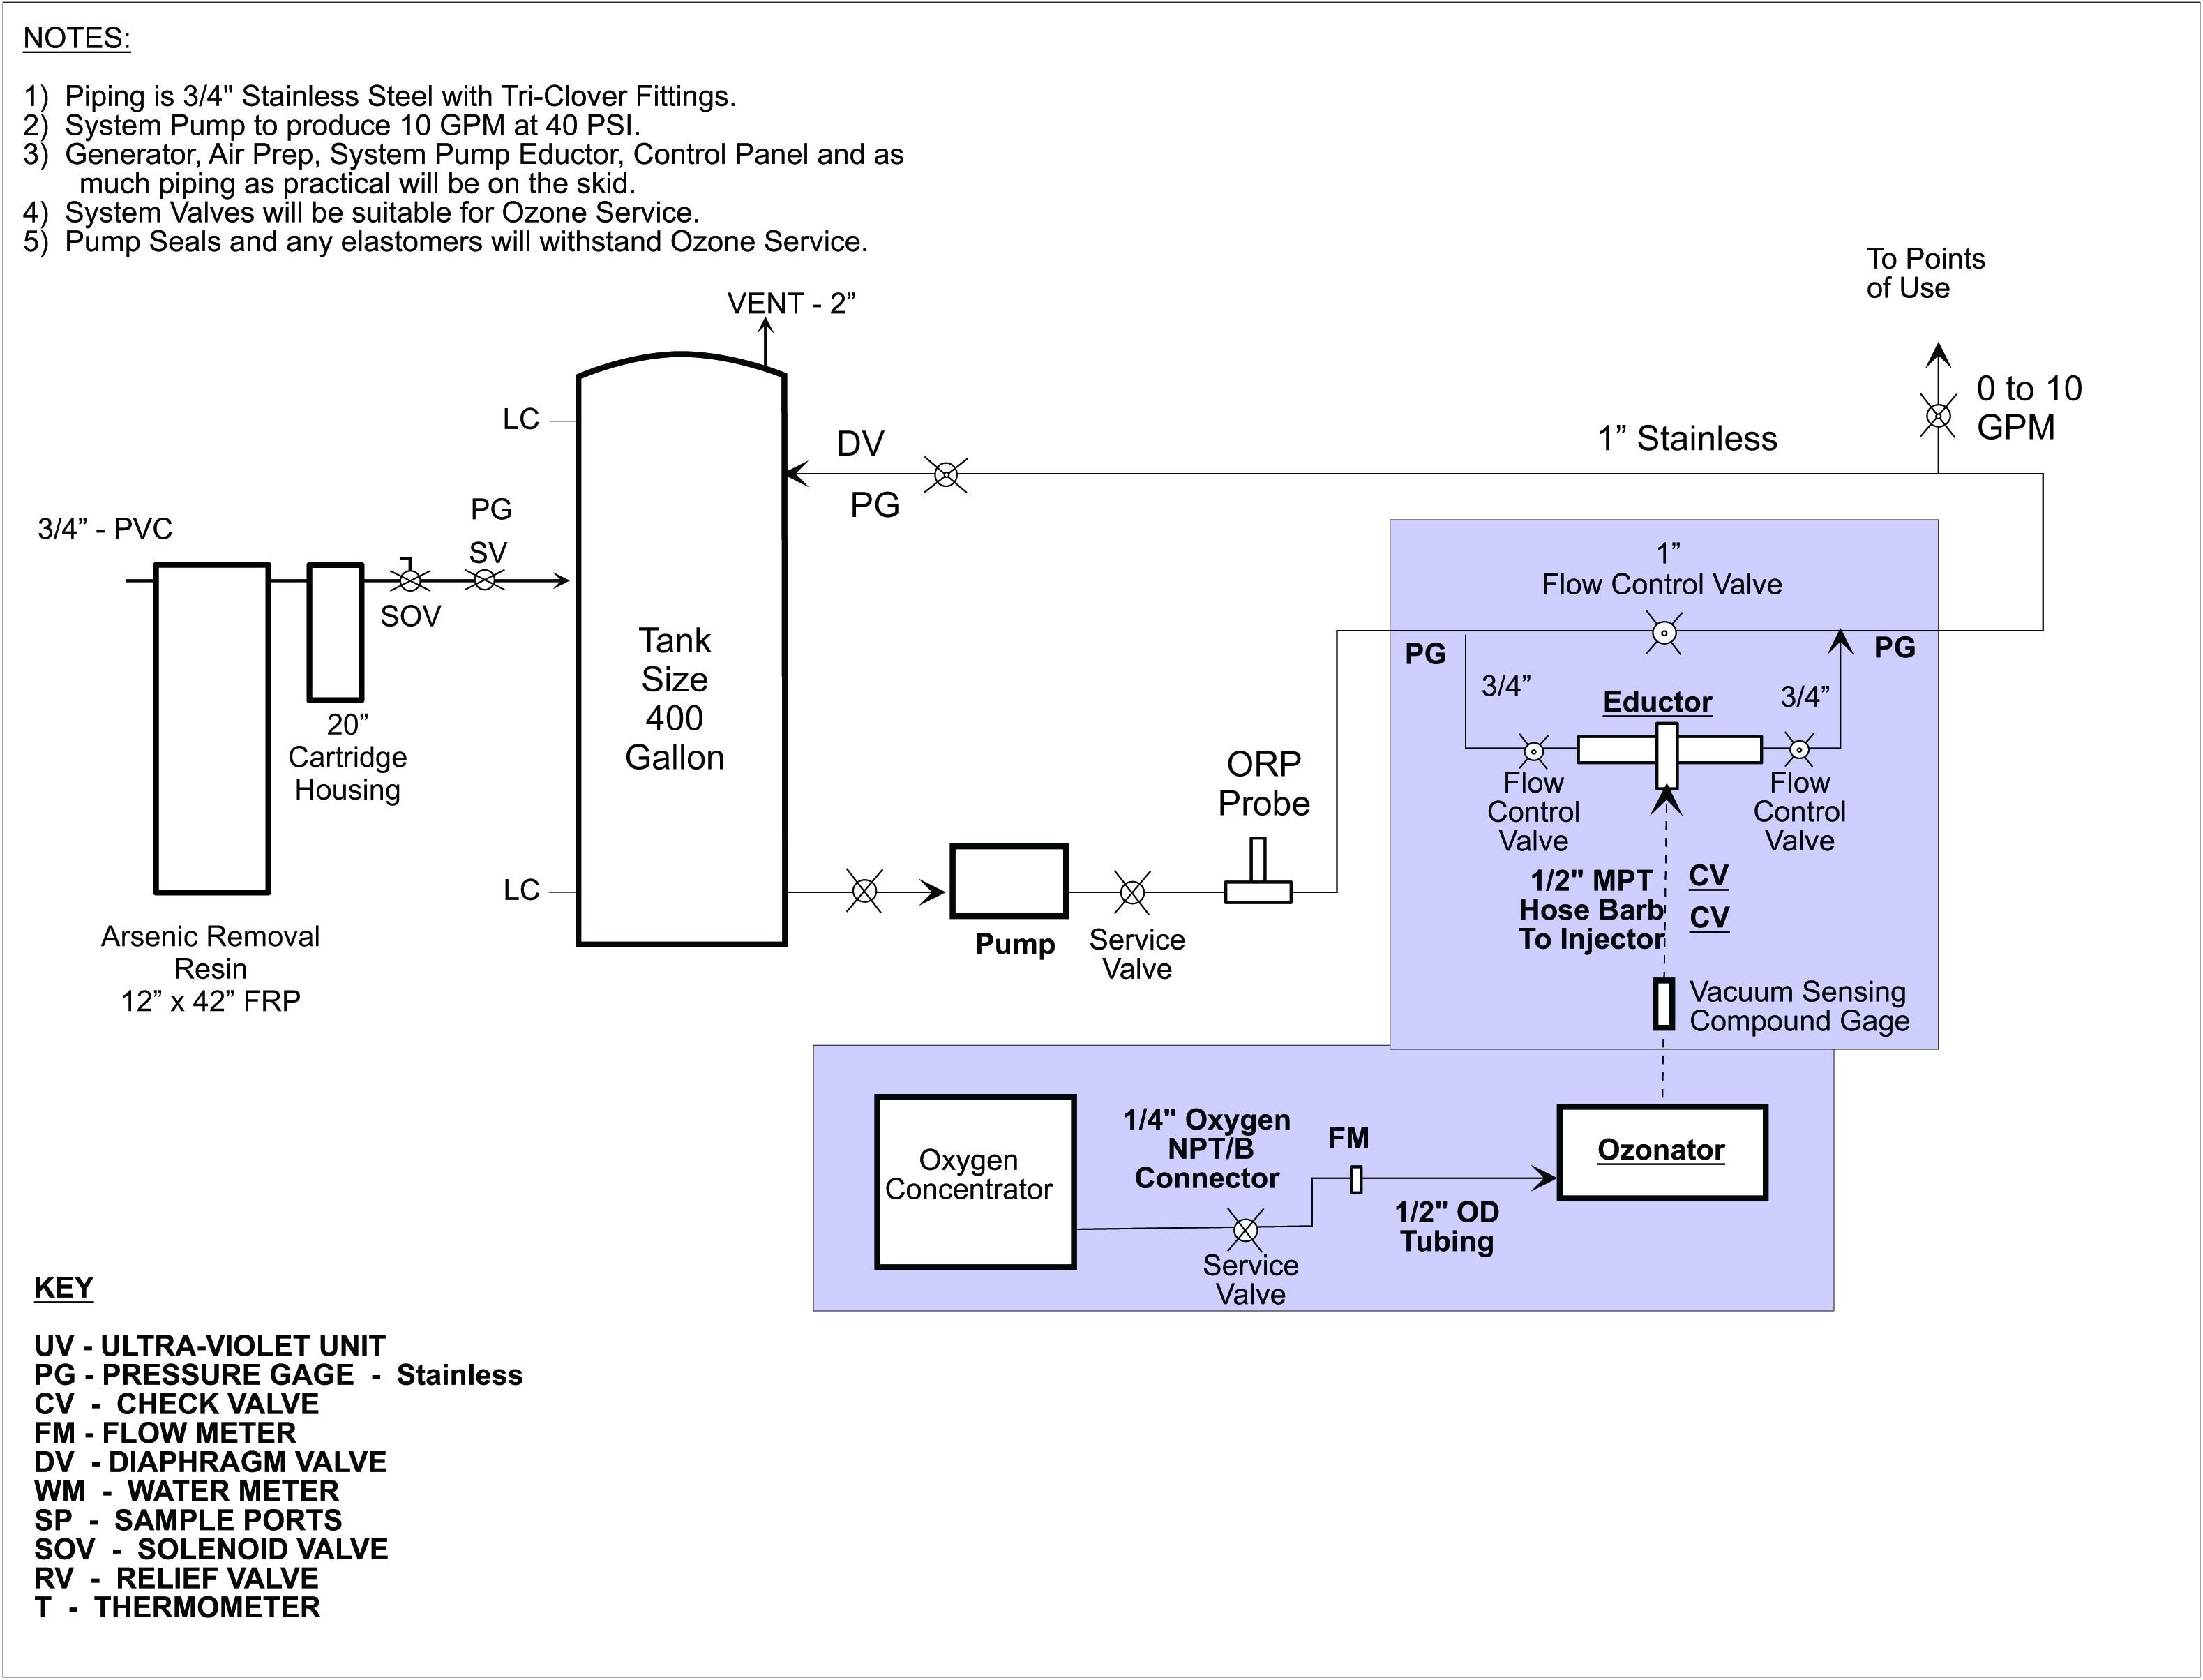 audible logic tester circuit diagram tradeoficcom extended wiring audible logic tester circuit diagram tradeoficcom